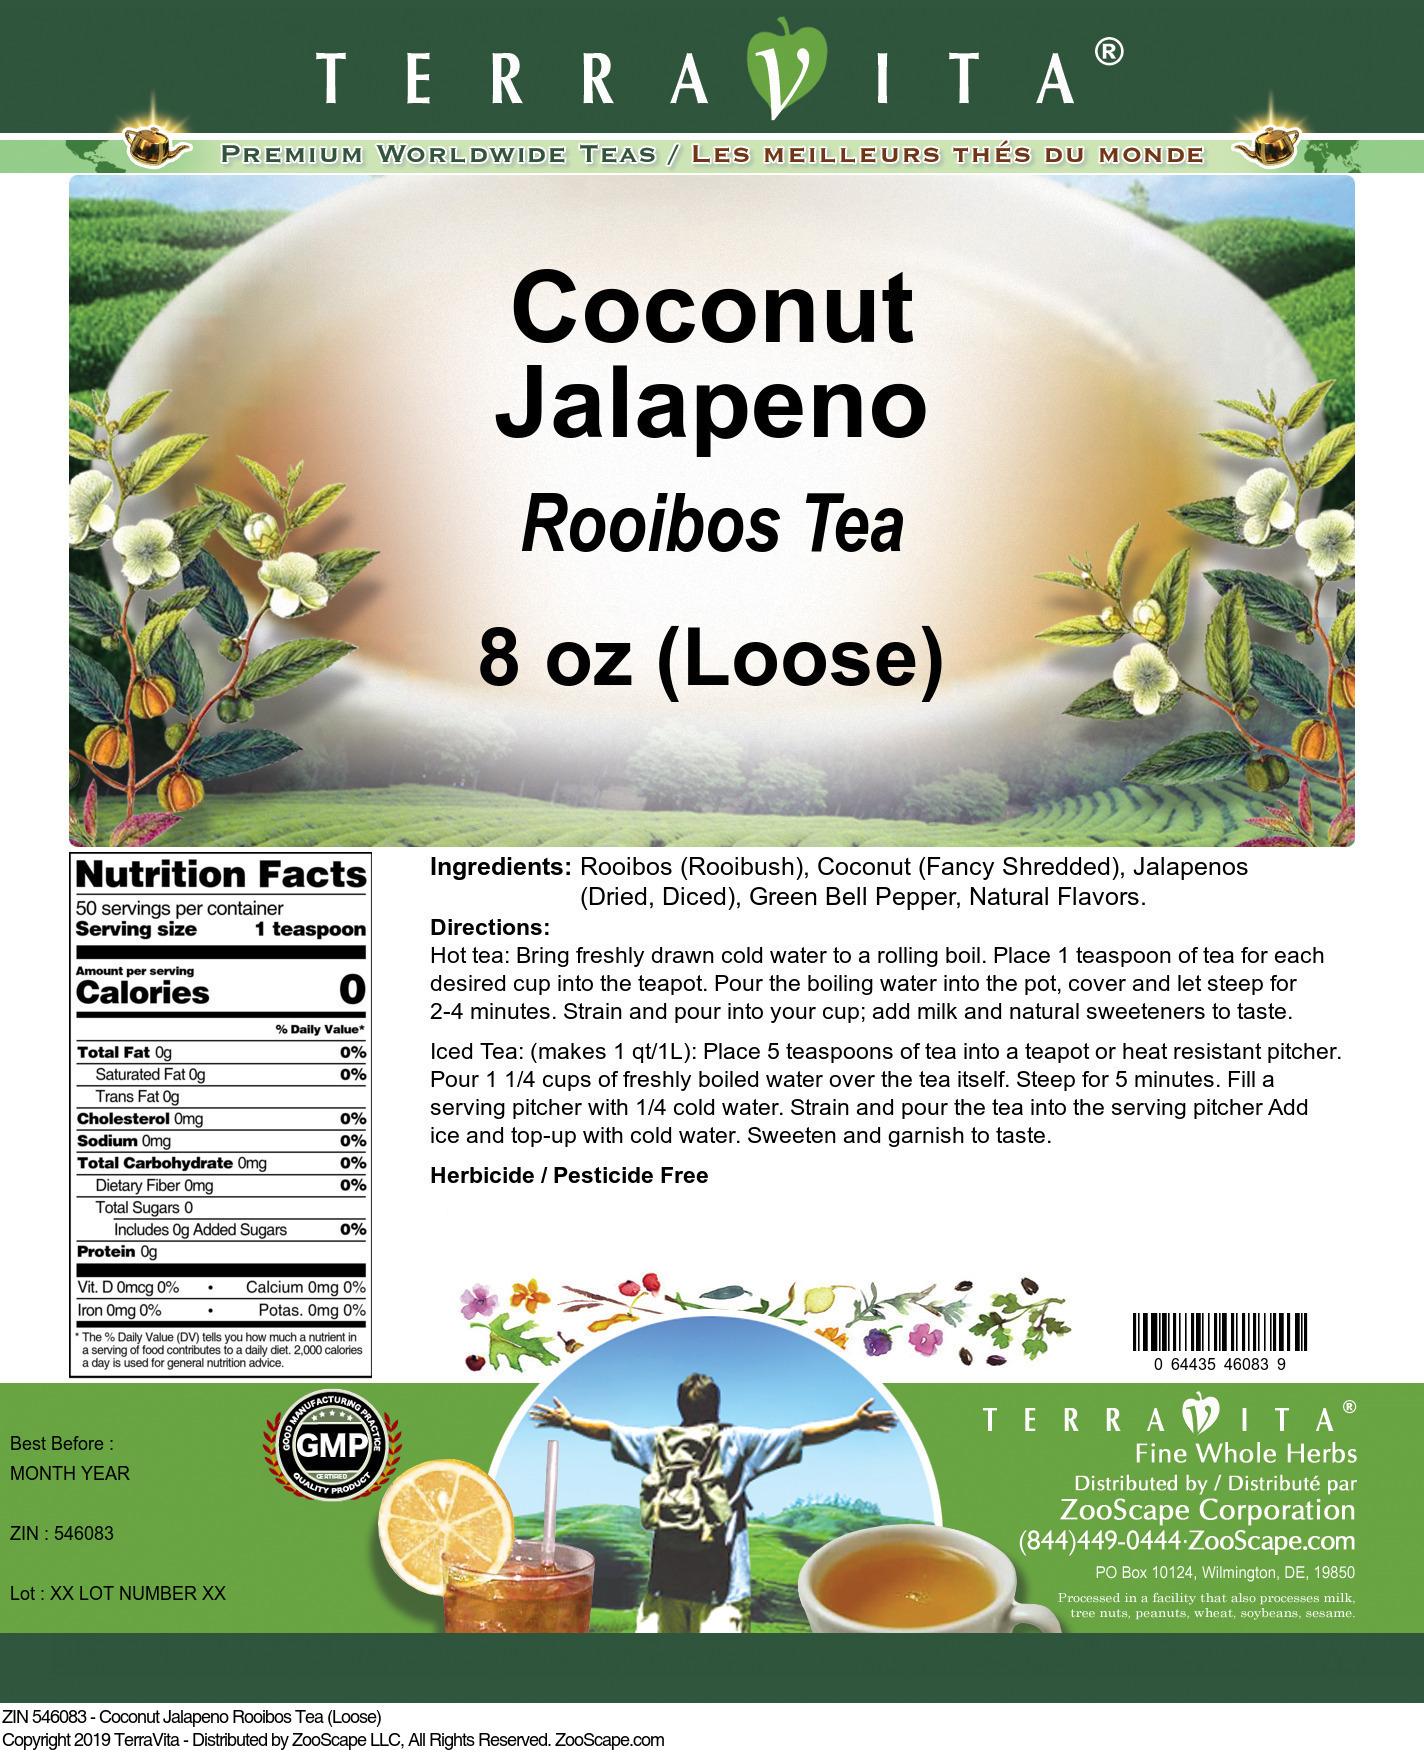 Coconut Jalapeno Rooibos Tea (Loose)